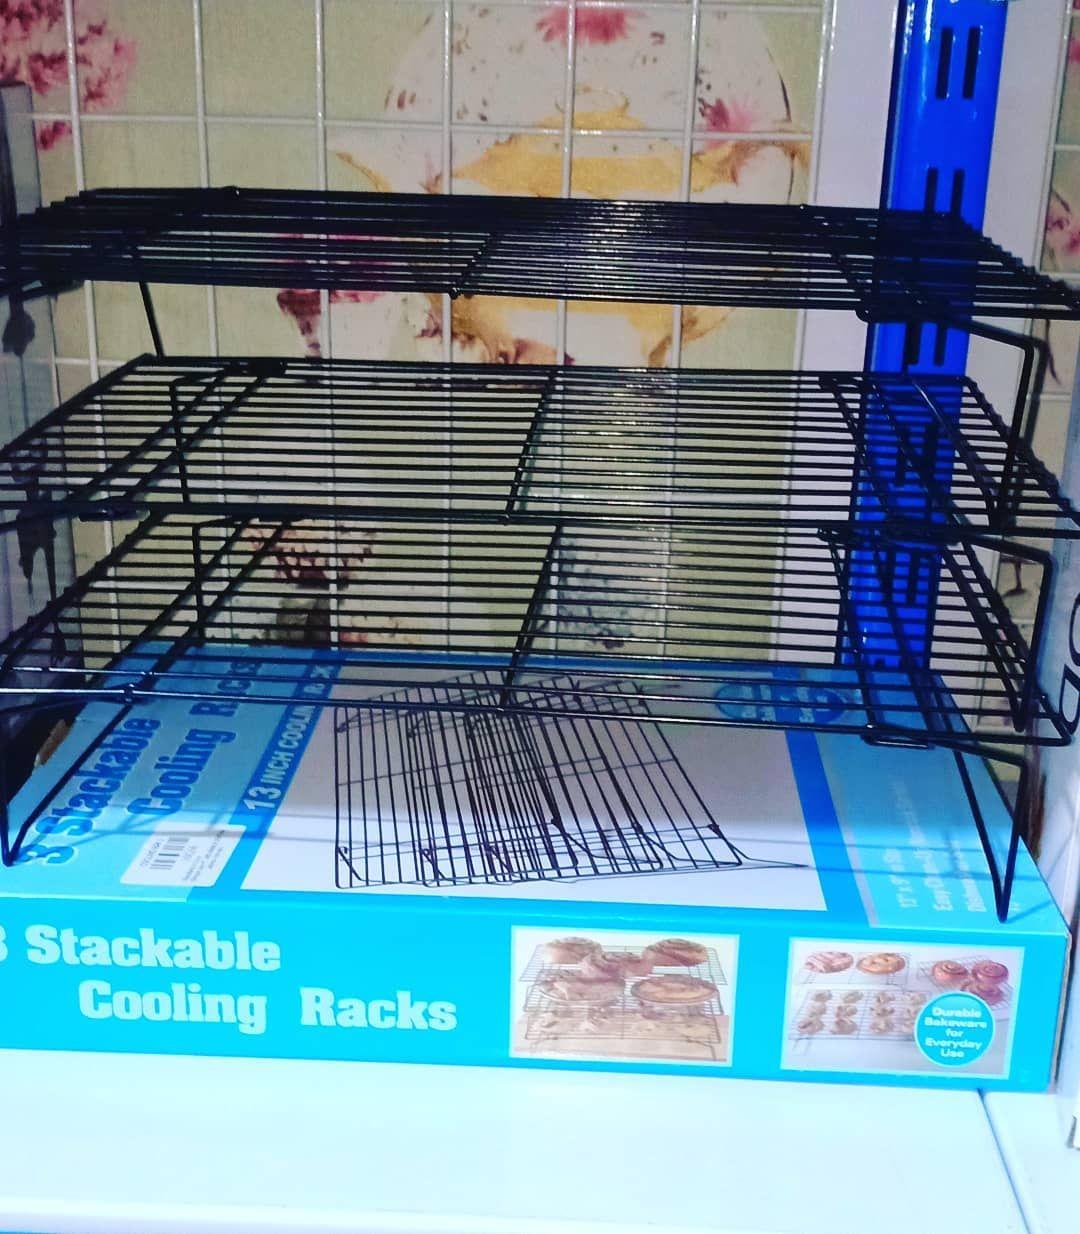 Kitchen Stuff Cooling Racks Stackable Racks